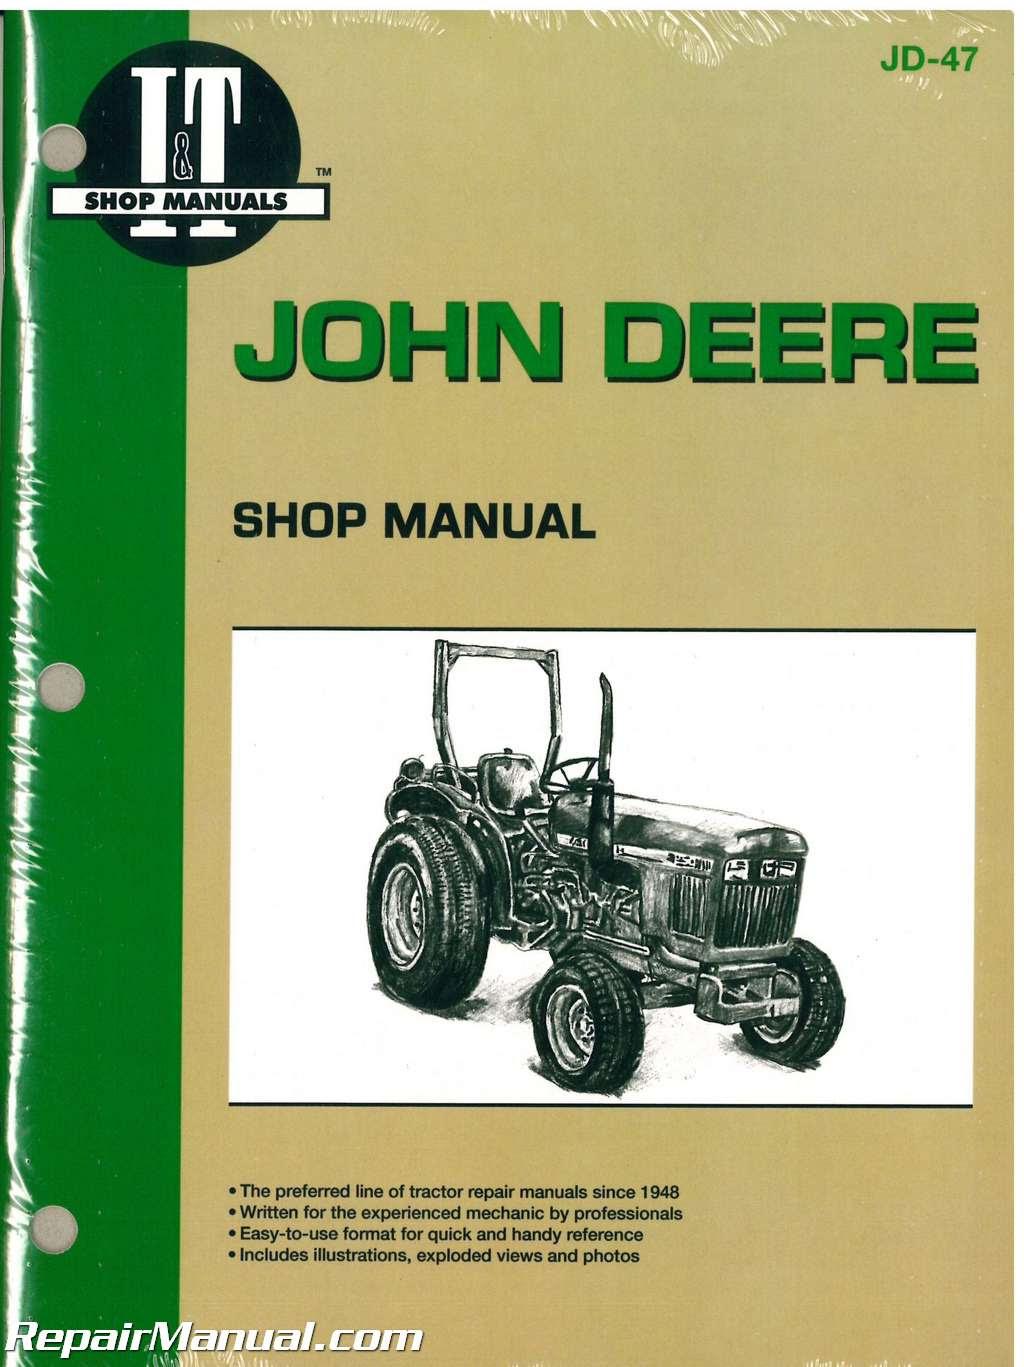 John Deere 850 950 1050 Tractor Workshop Manual : JD-47 | eBay